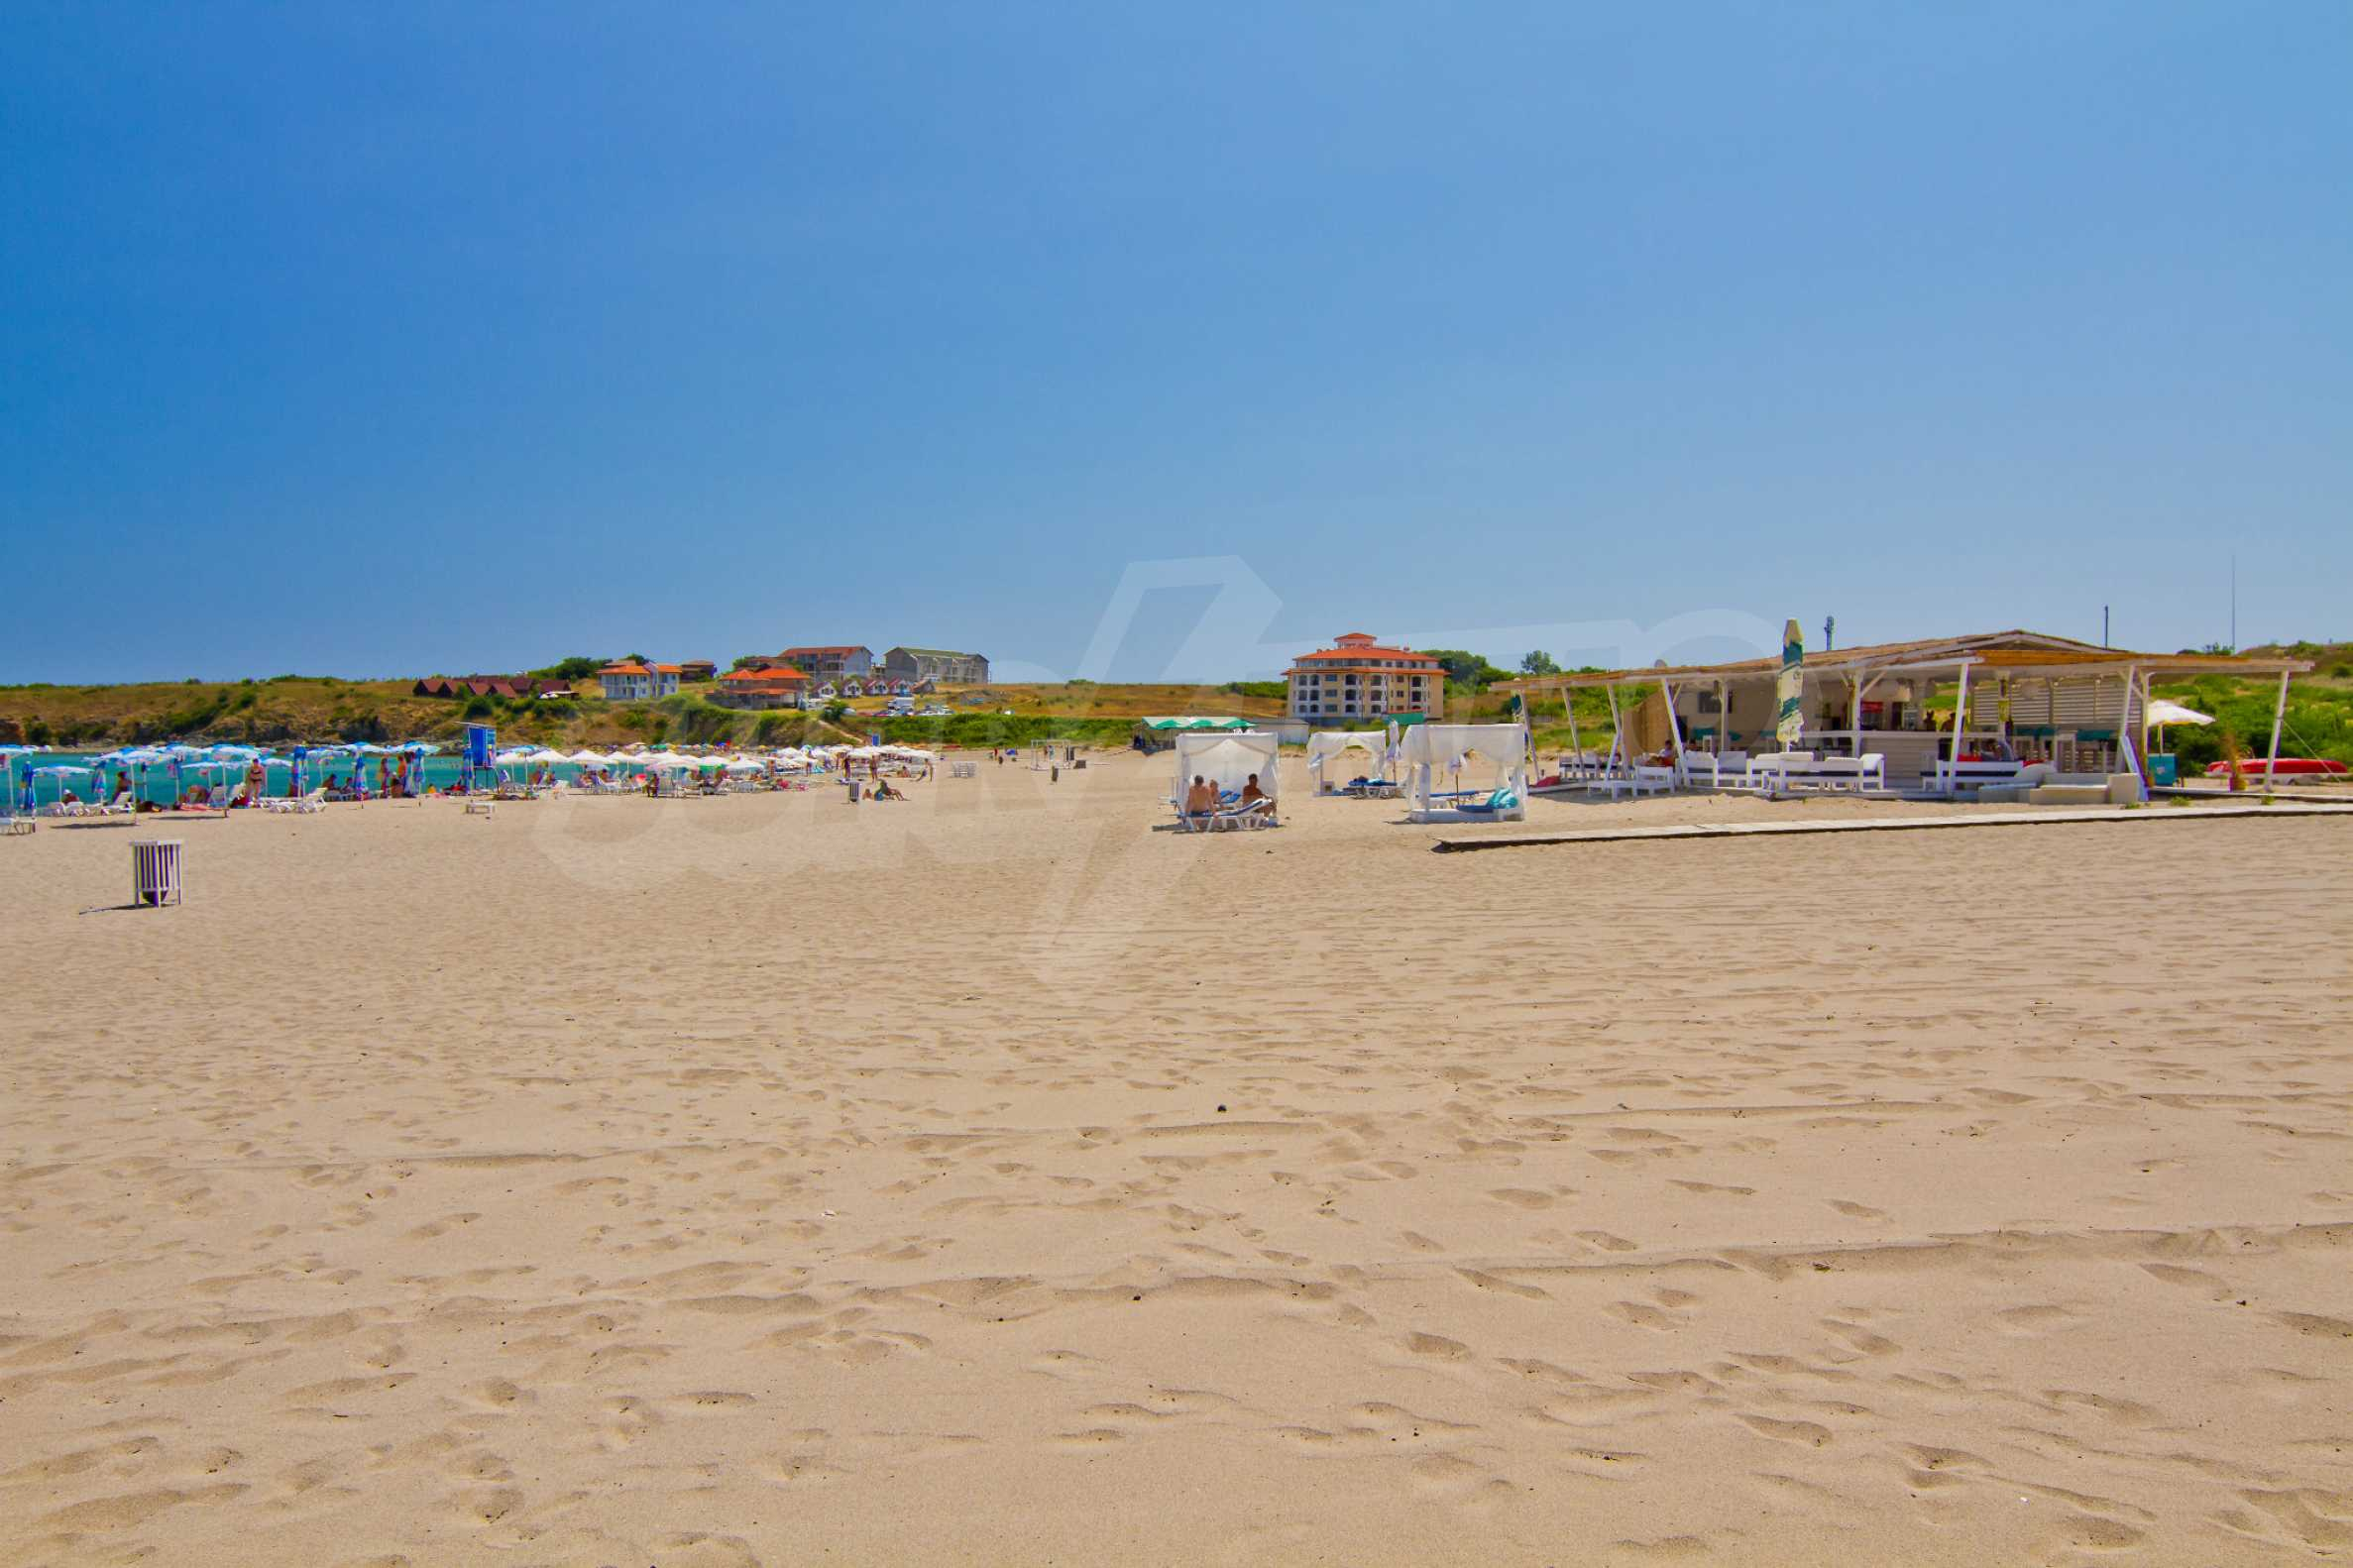 Примеа Бийч Резиденс / Primea Beach Residence 10